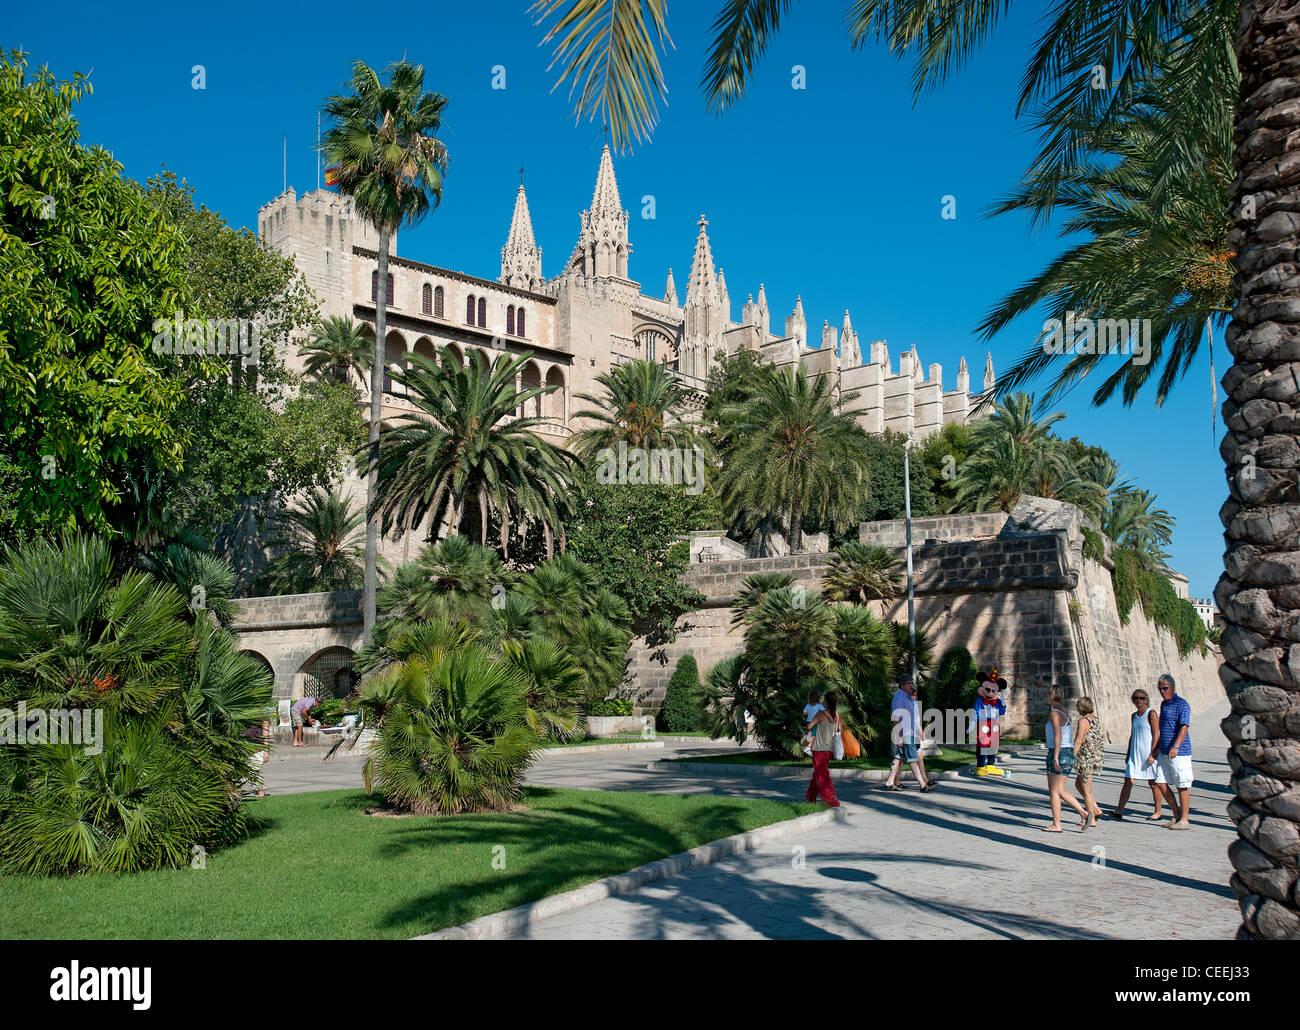 Dom Parc De La Mar Palma Mallorca Balearen Spanien Stockbild